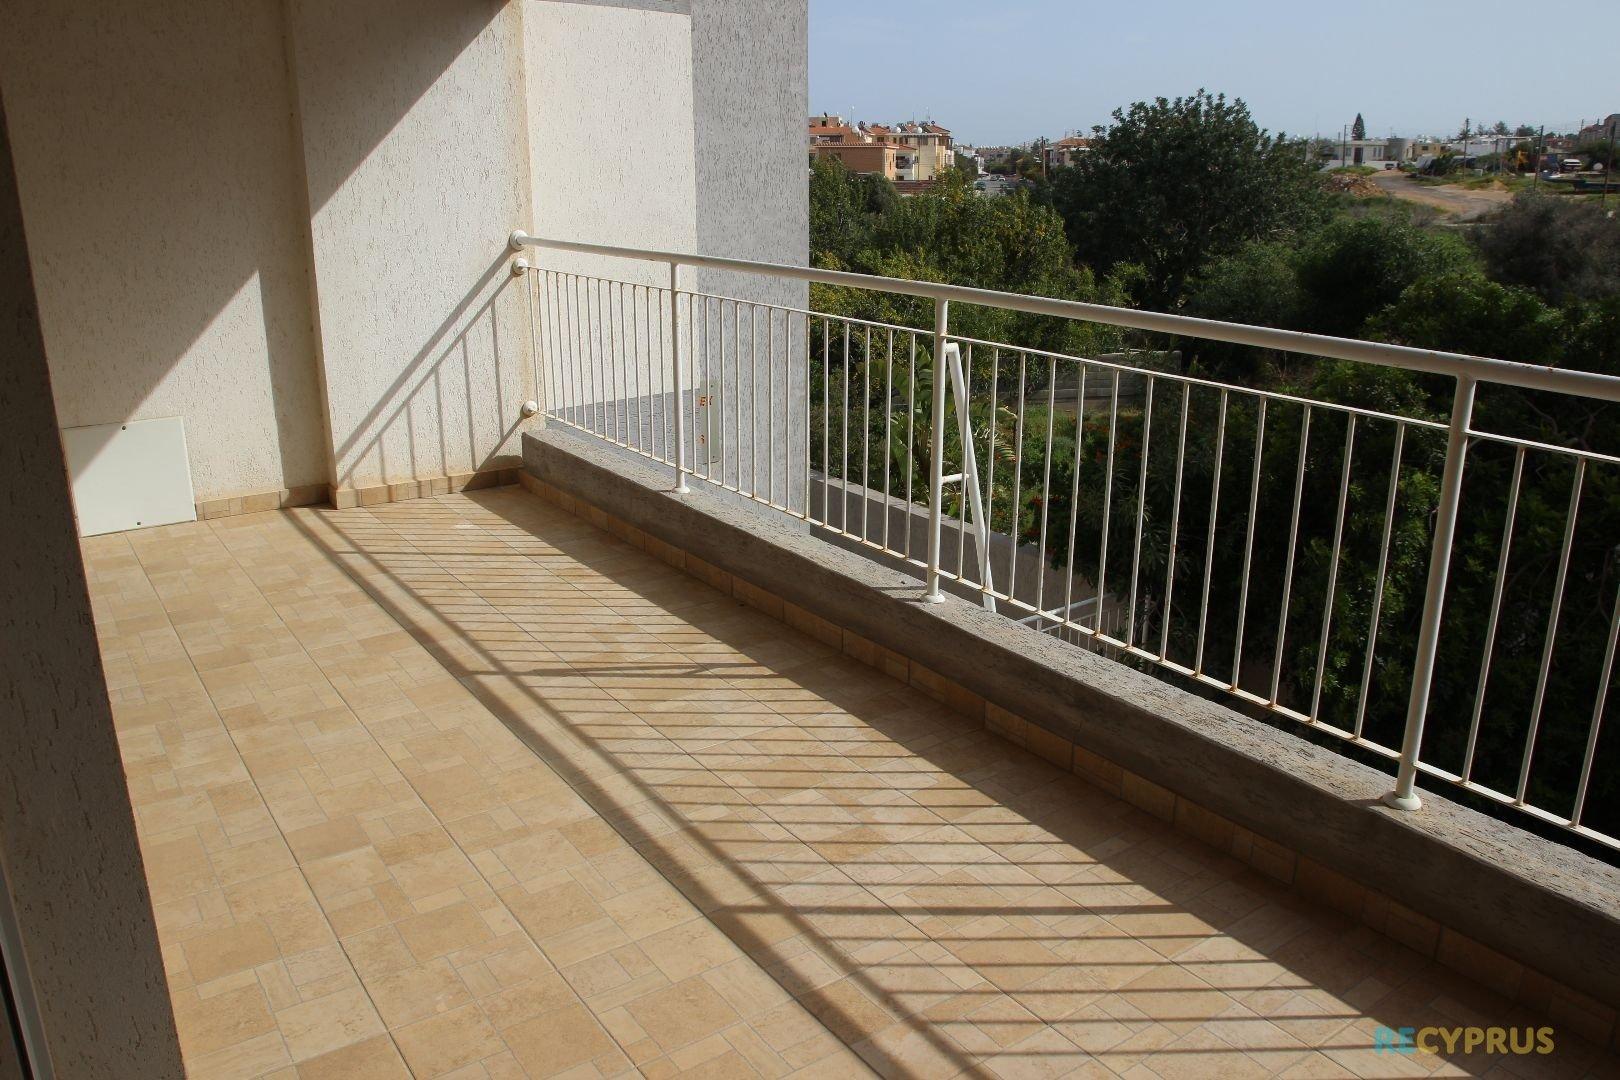 Apartment for sale Kapparis Famagusta Cyprus 11 3519